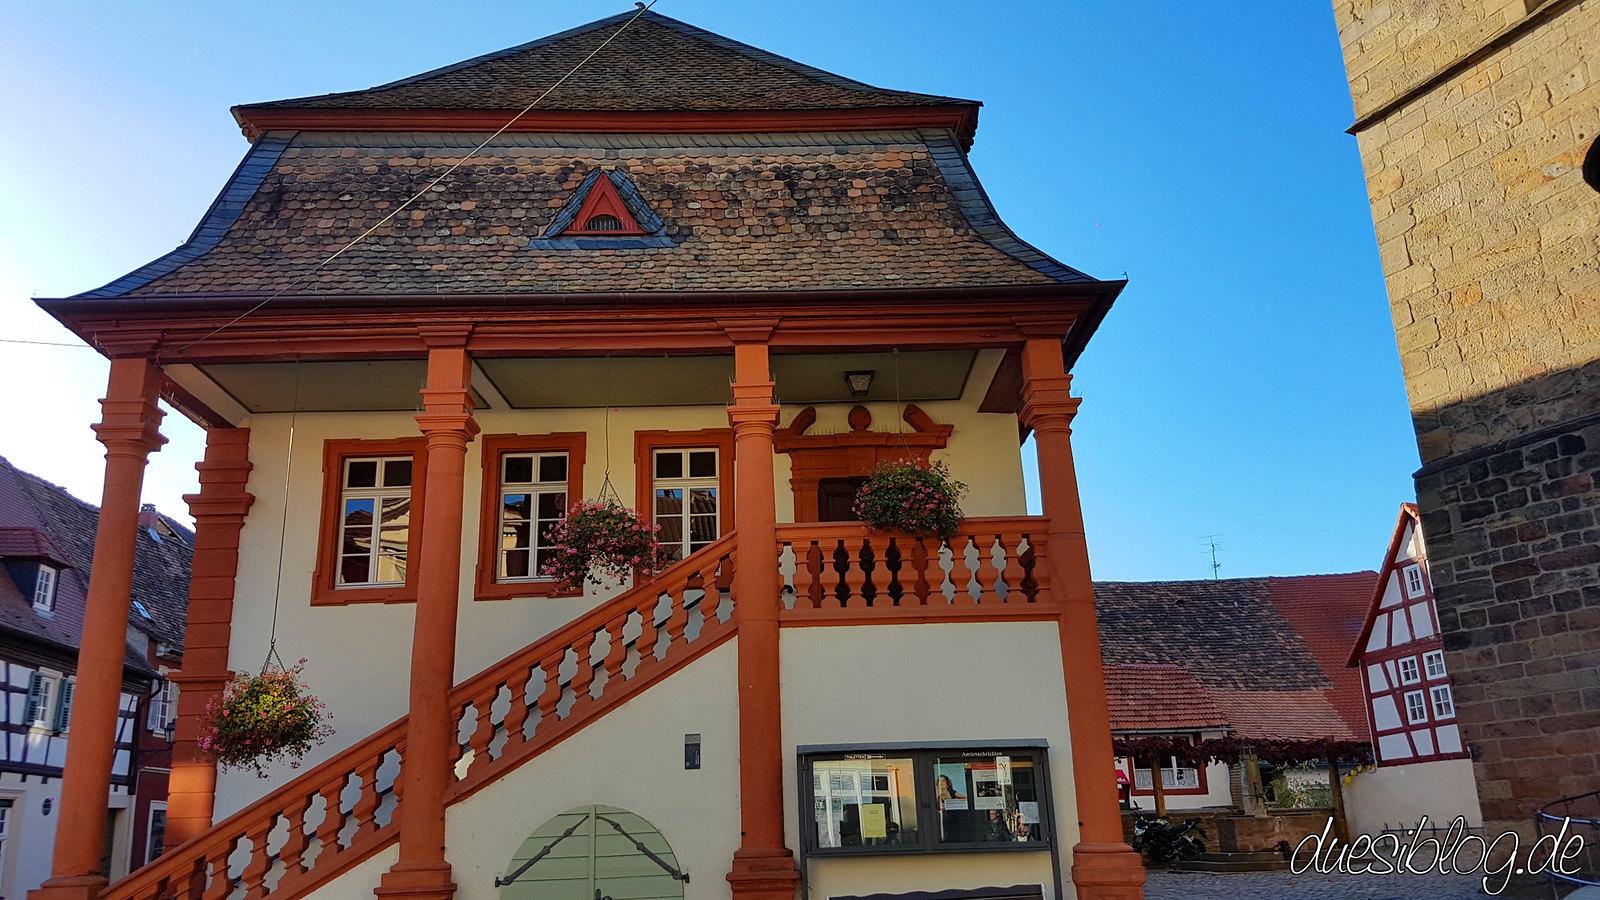 Freinsheim Pfalz duesiblog travelblog 23